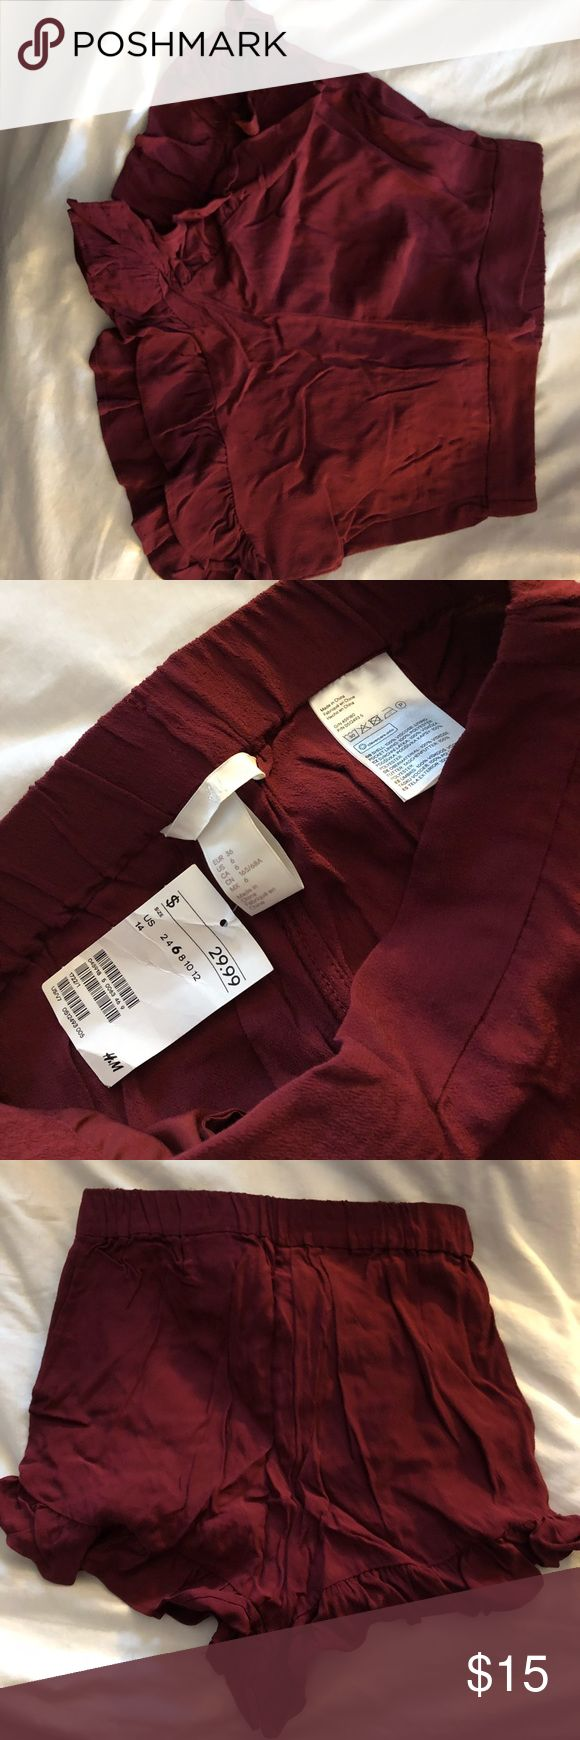 Maroon shorts H&M maroon shorts, never worn, run small, new with tags H&M Shorts